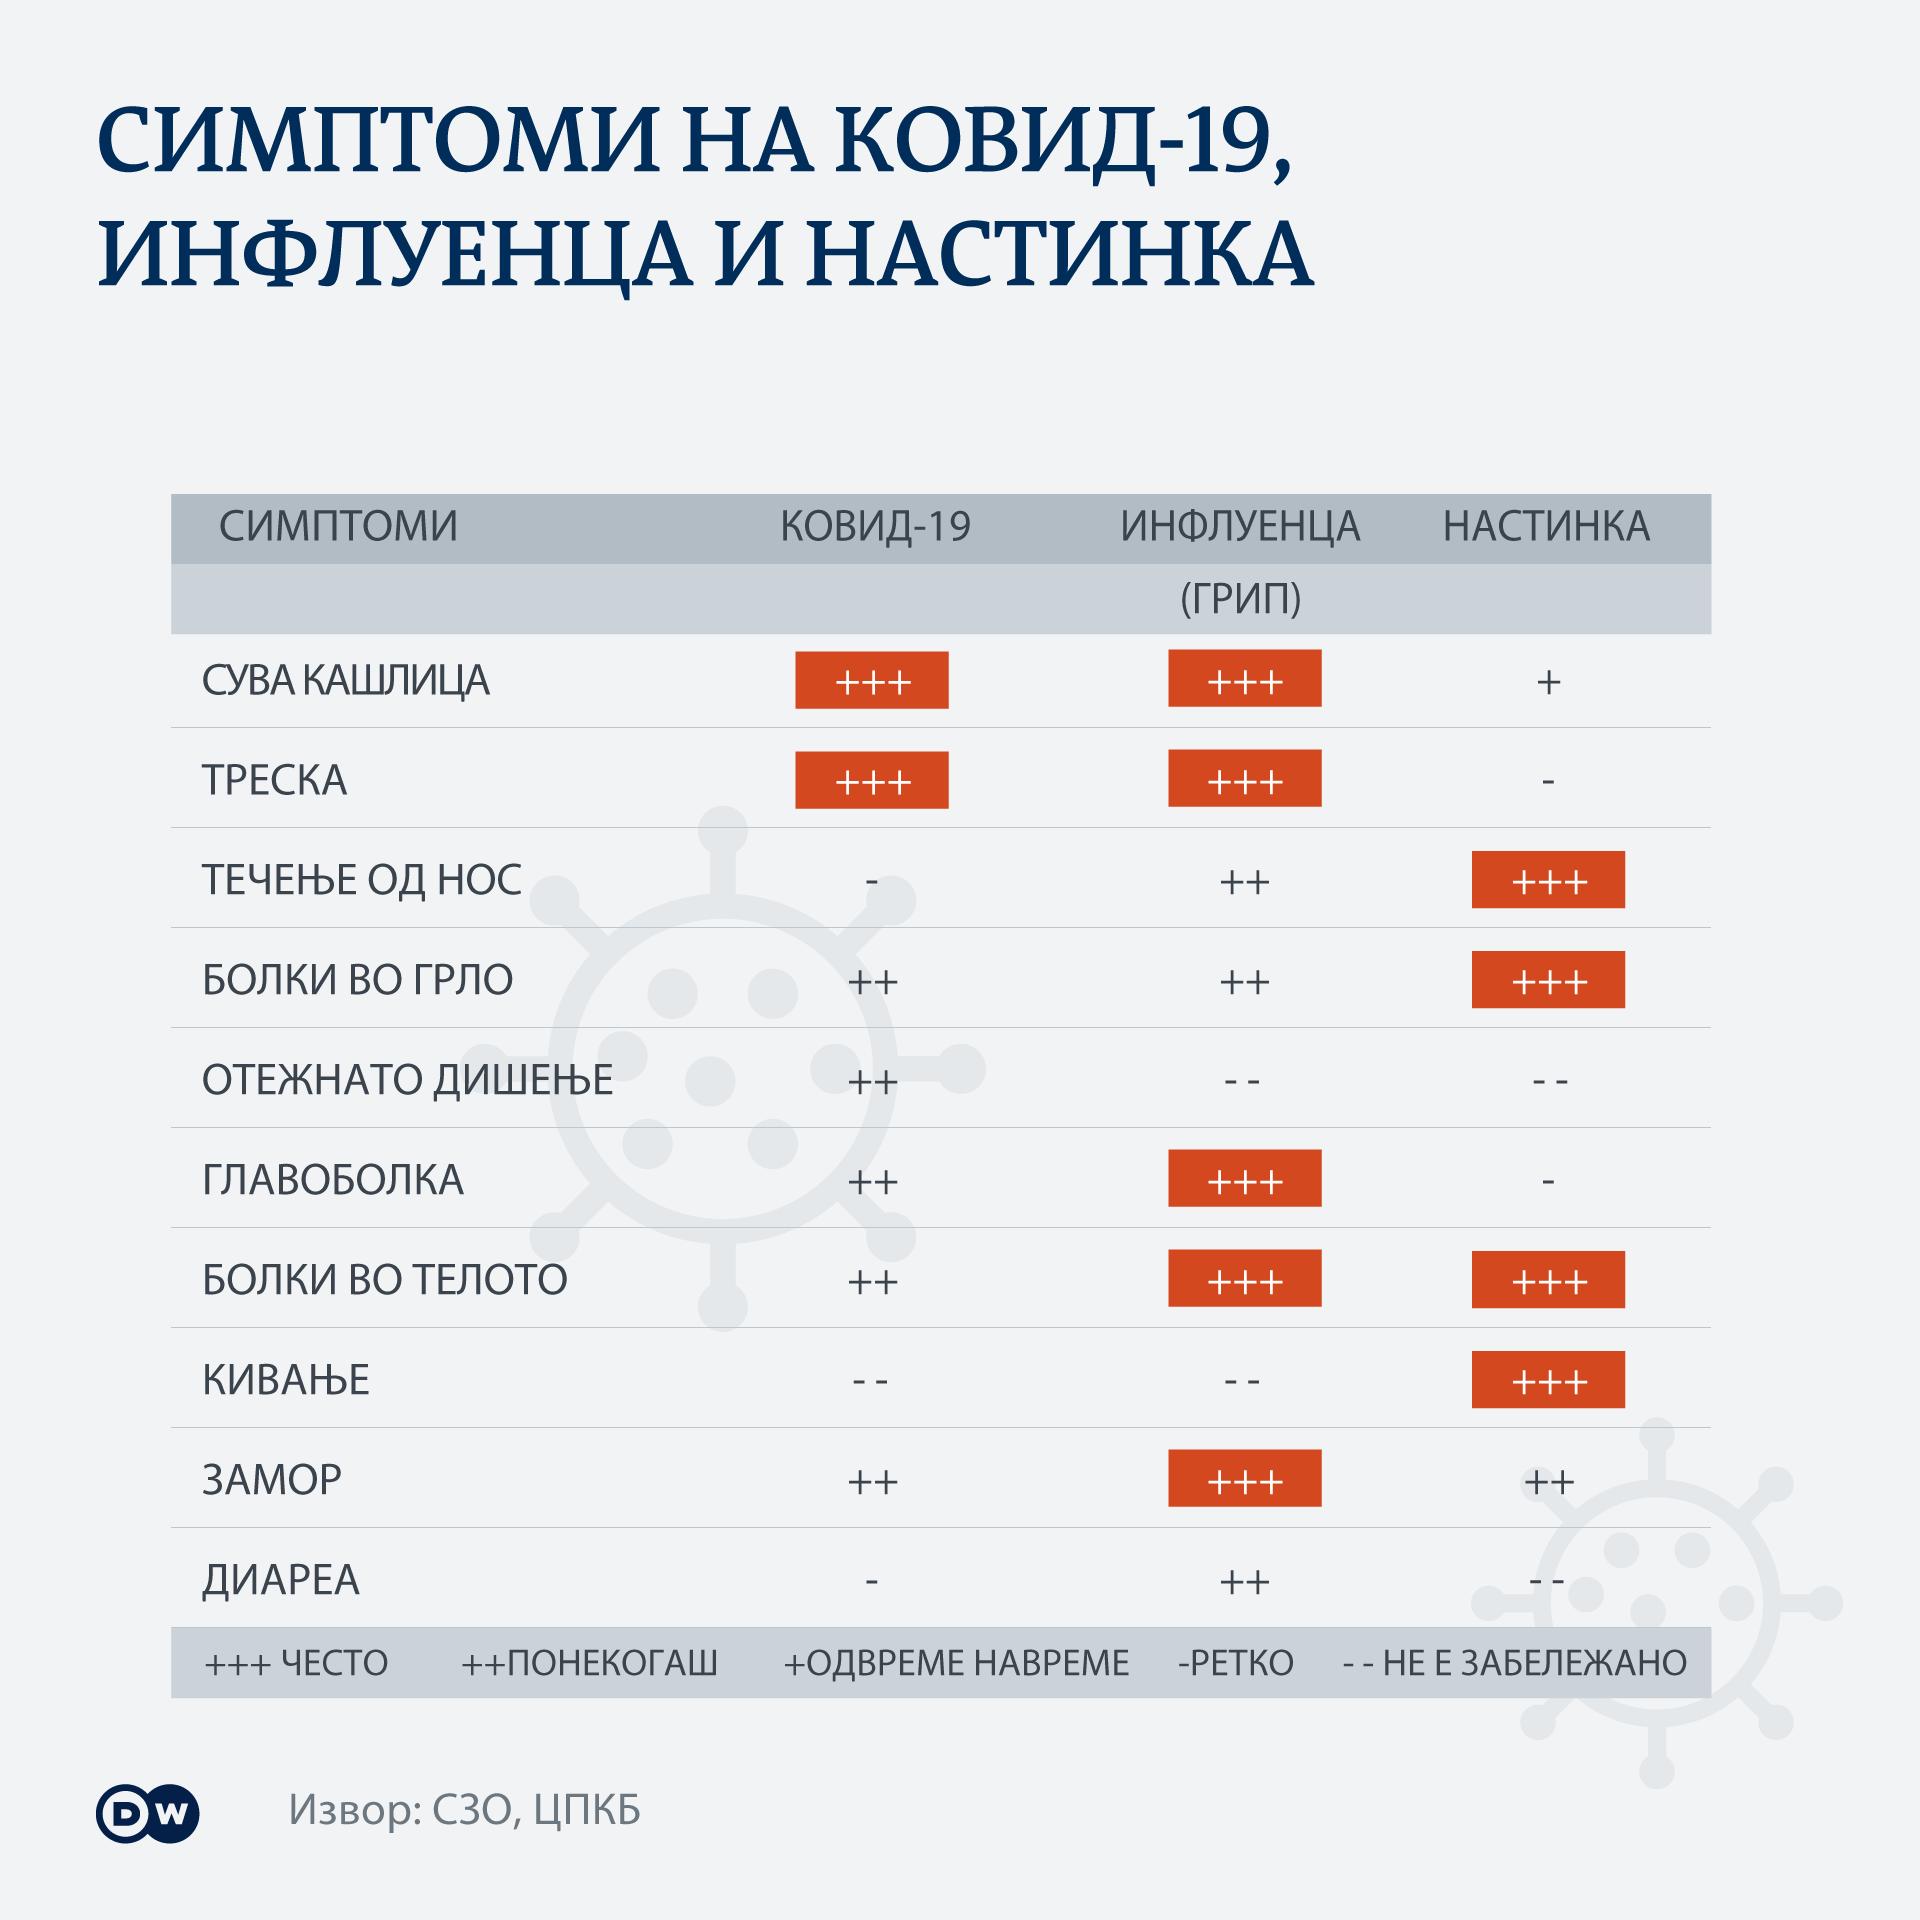 Infografik Symptome Corona, Grippe und Erkältung im Vergleich MK